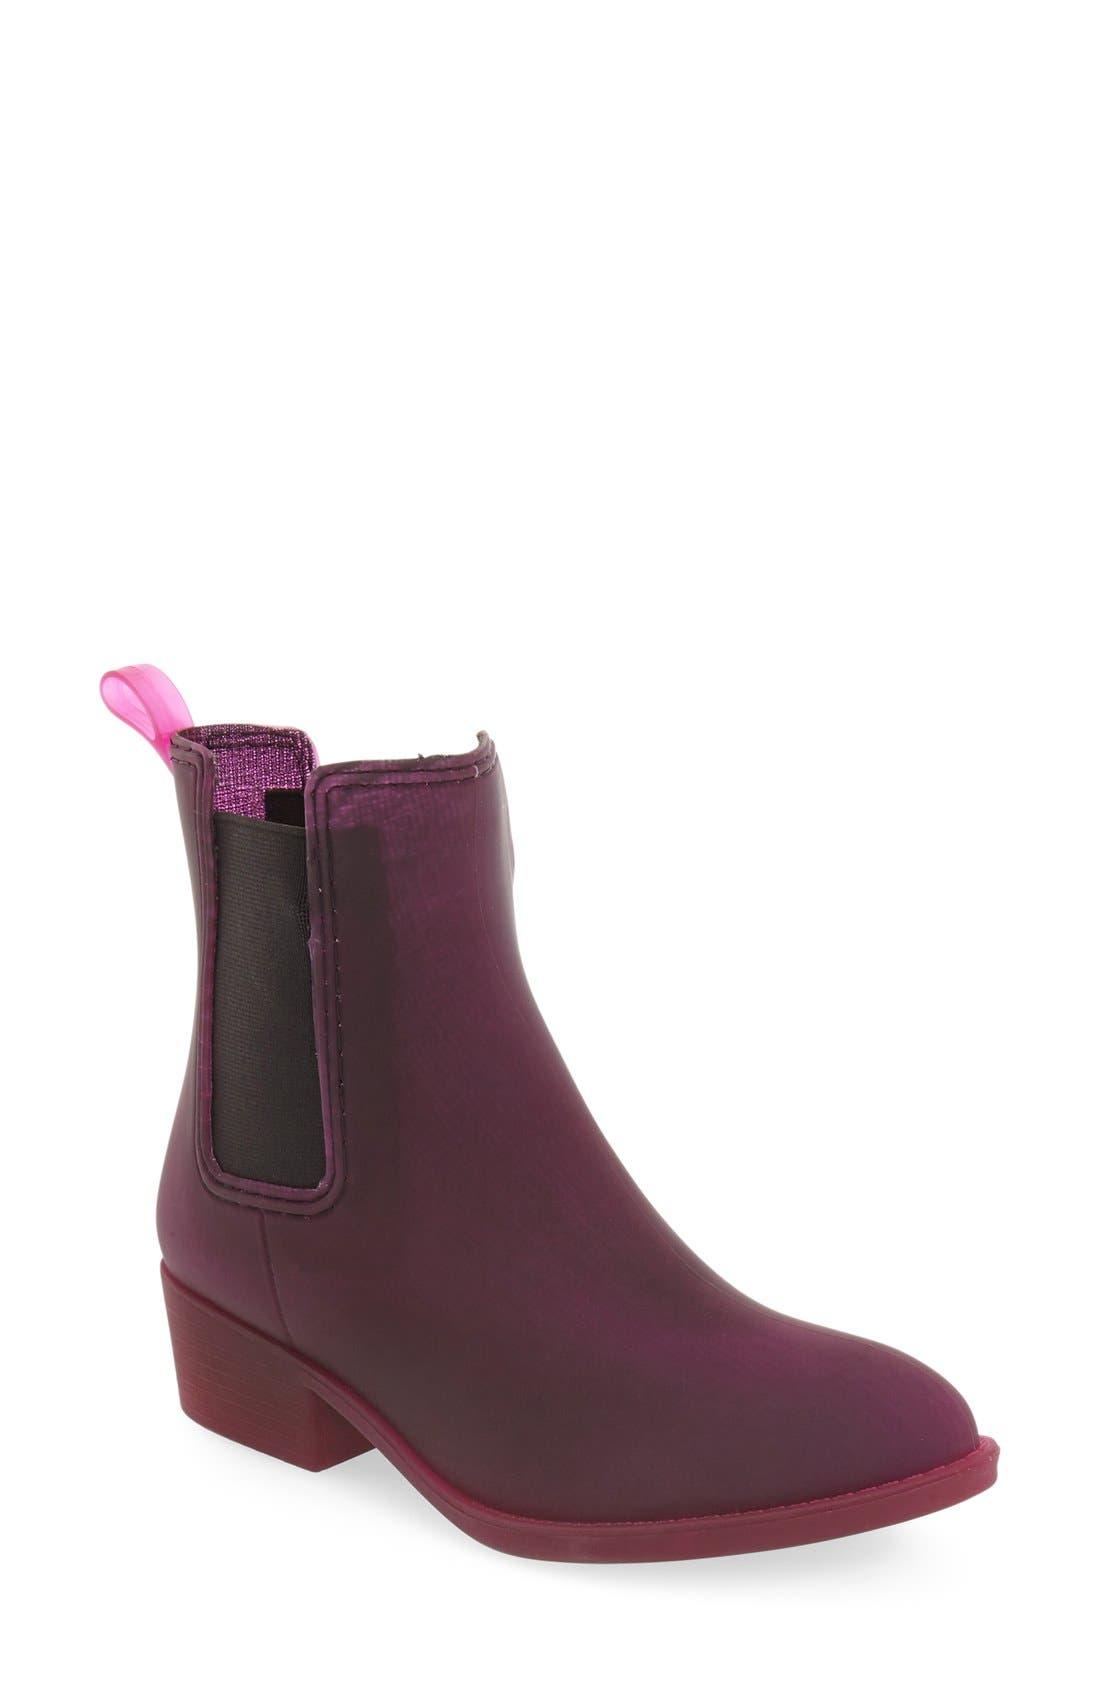 Main Image - Jeffrey Campbell 'Stormy' Rain Boot (Women)